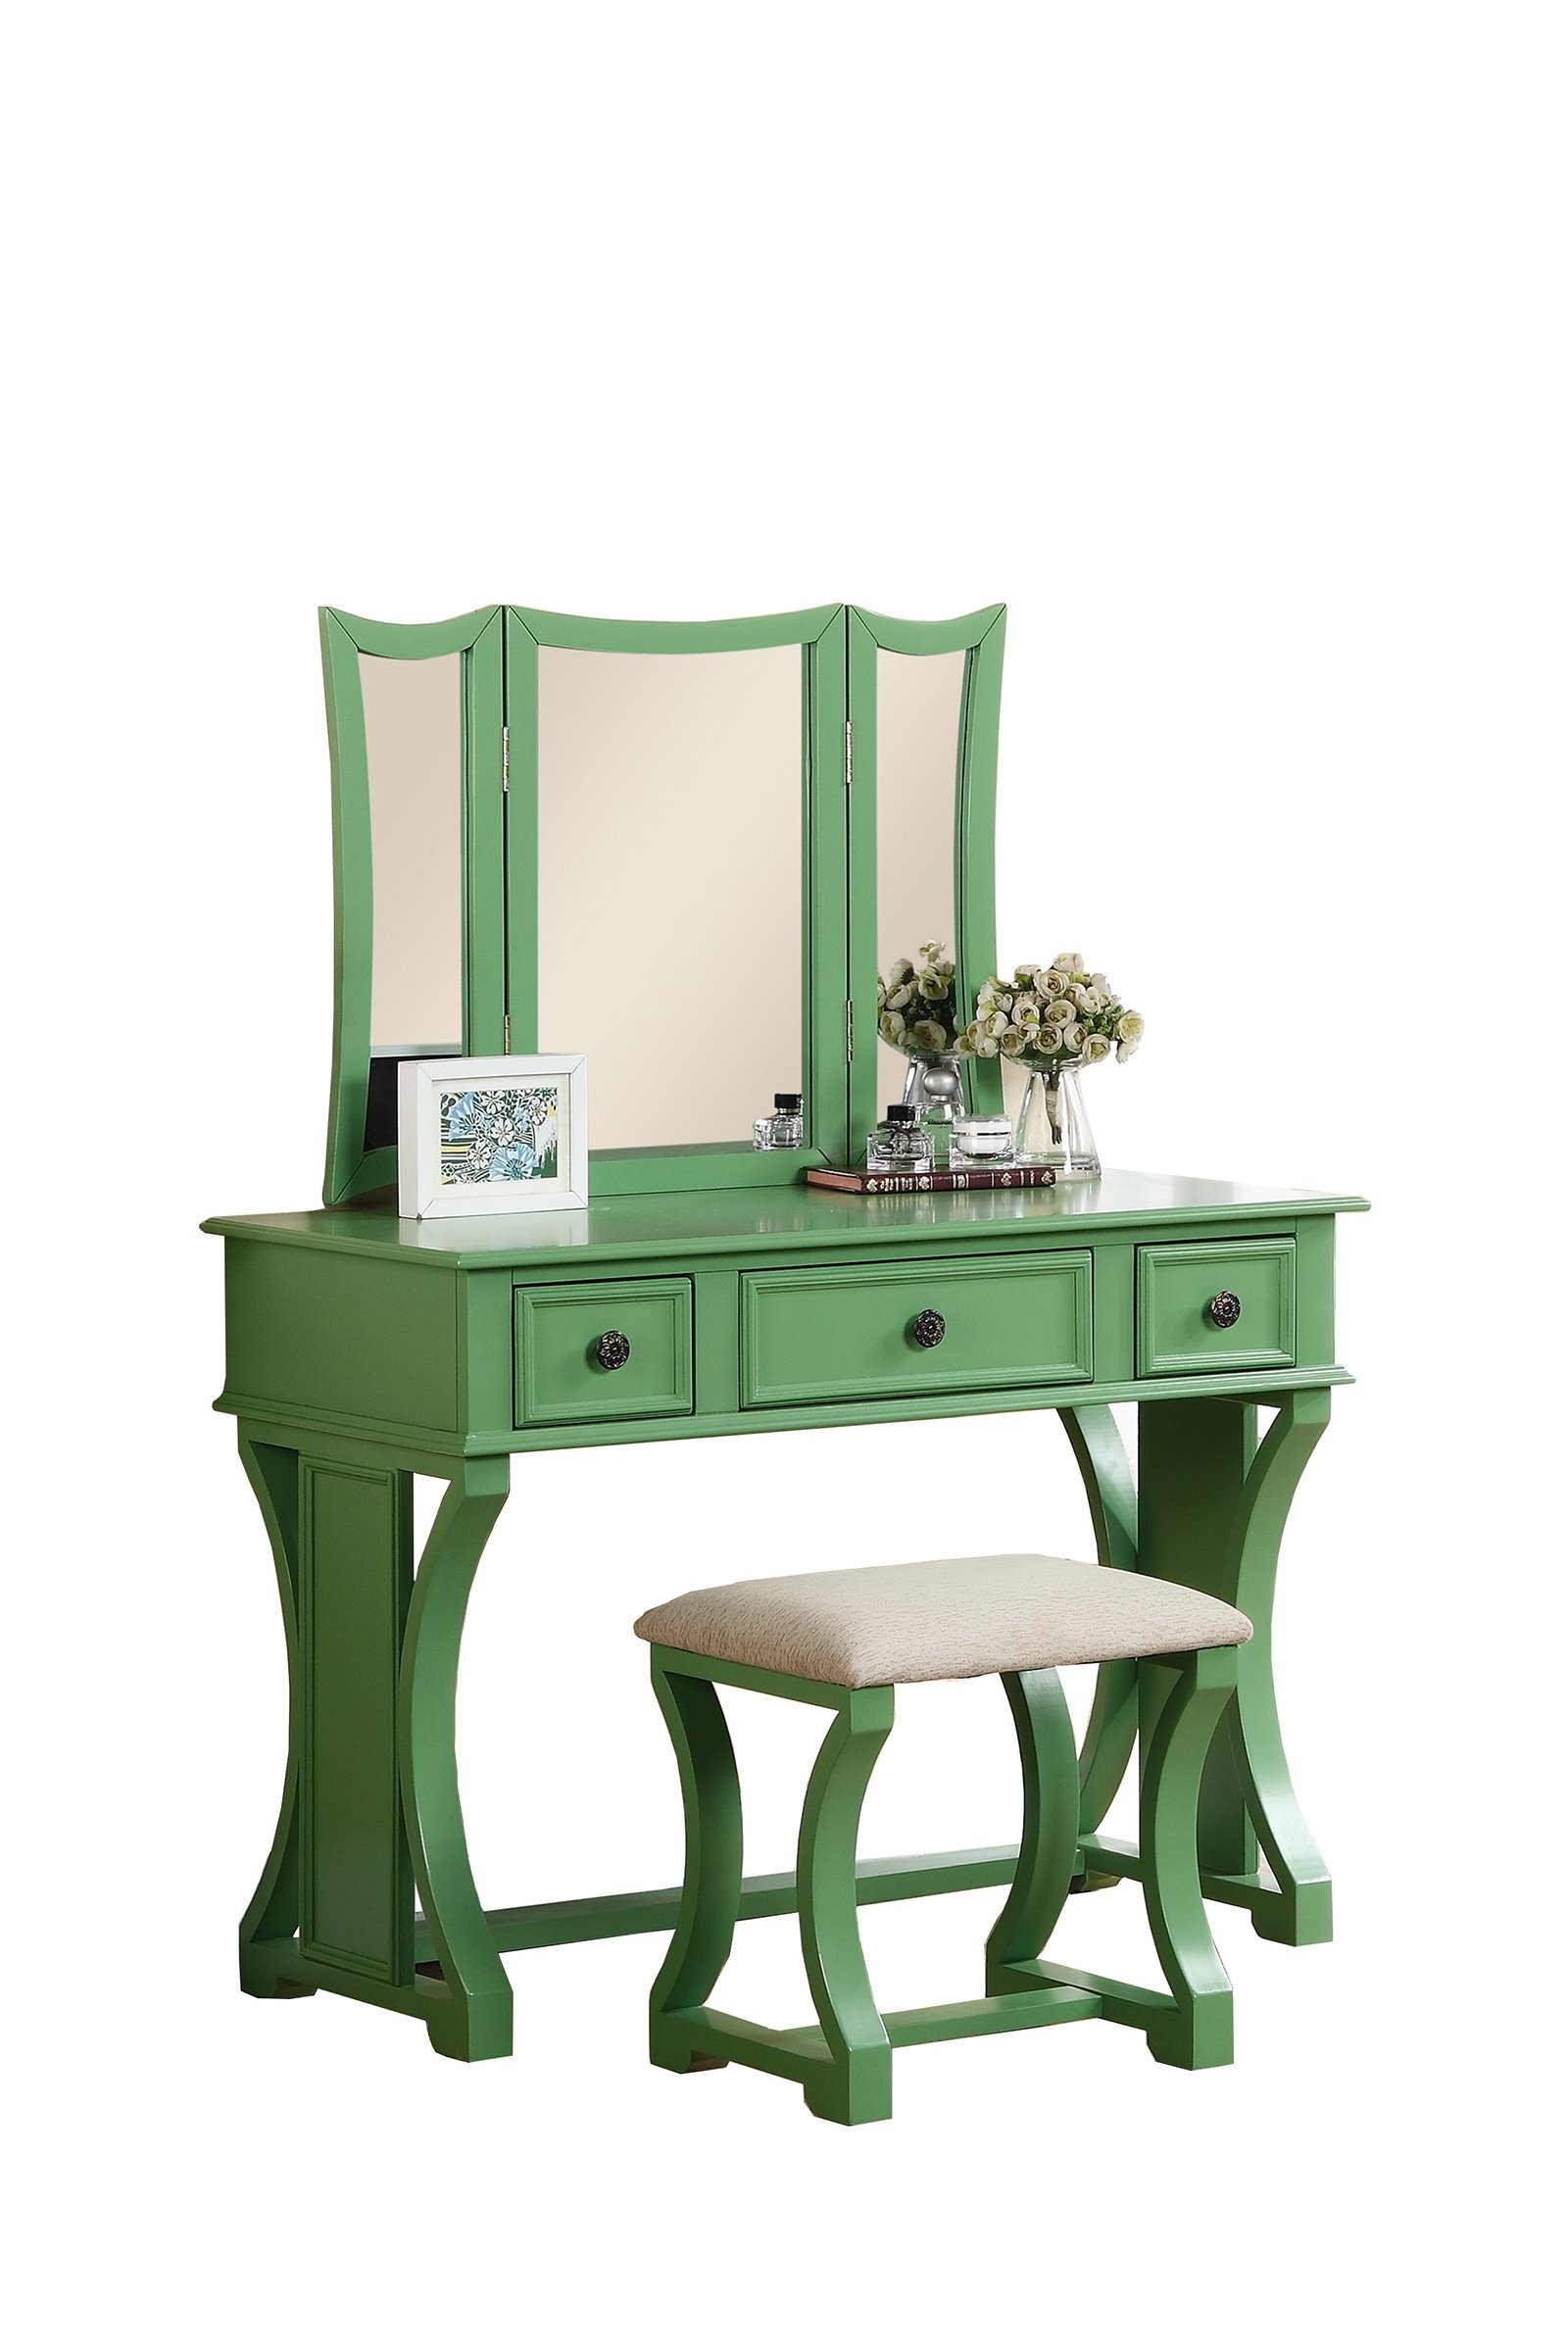 Poundex Bobkona Edna Vanity Set with Stool, Apple Green